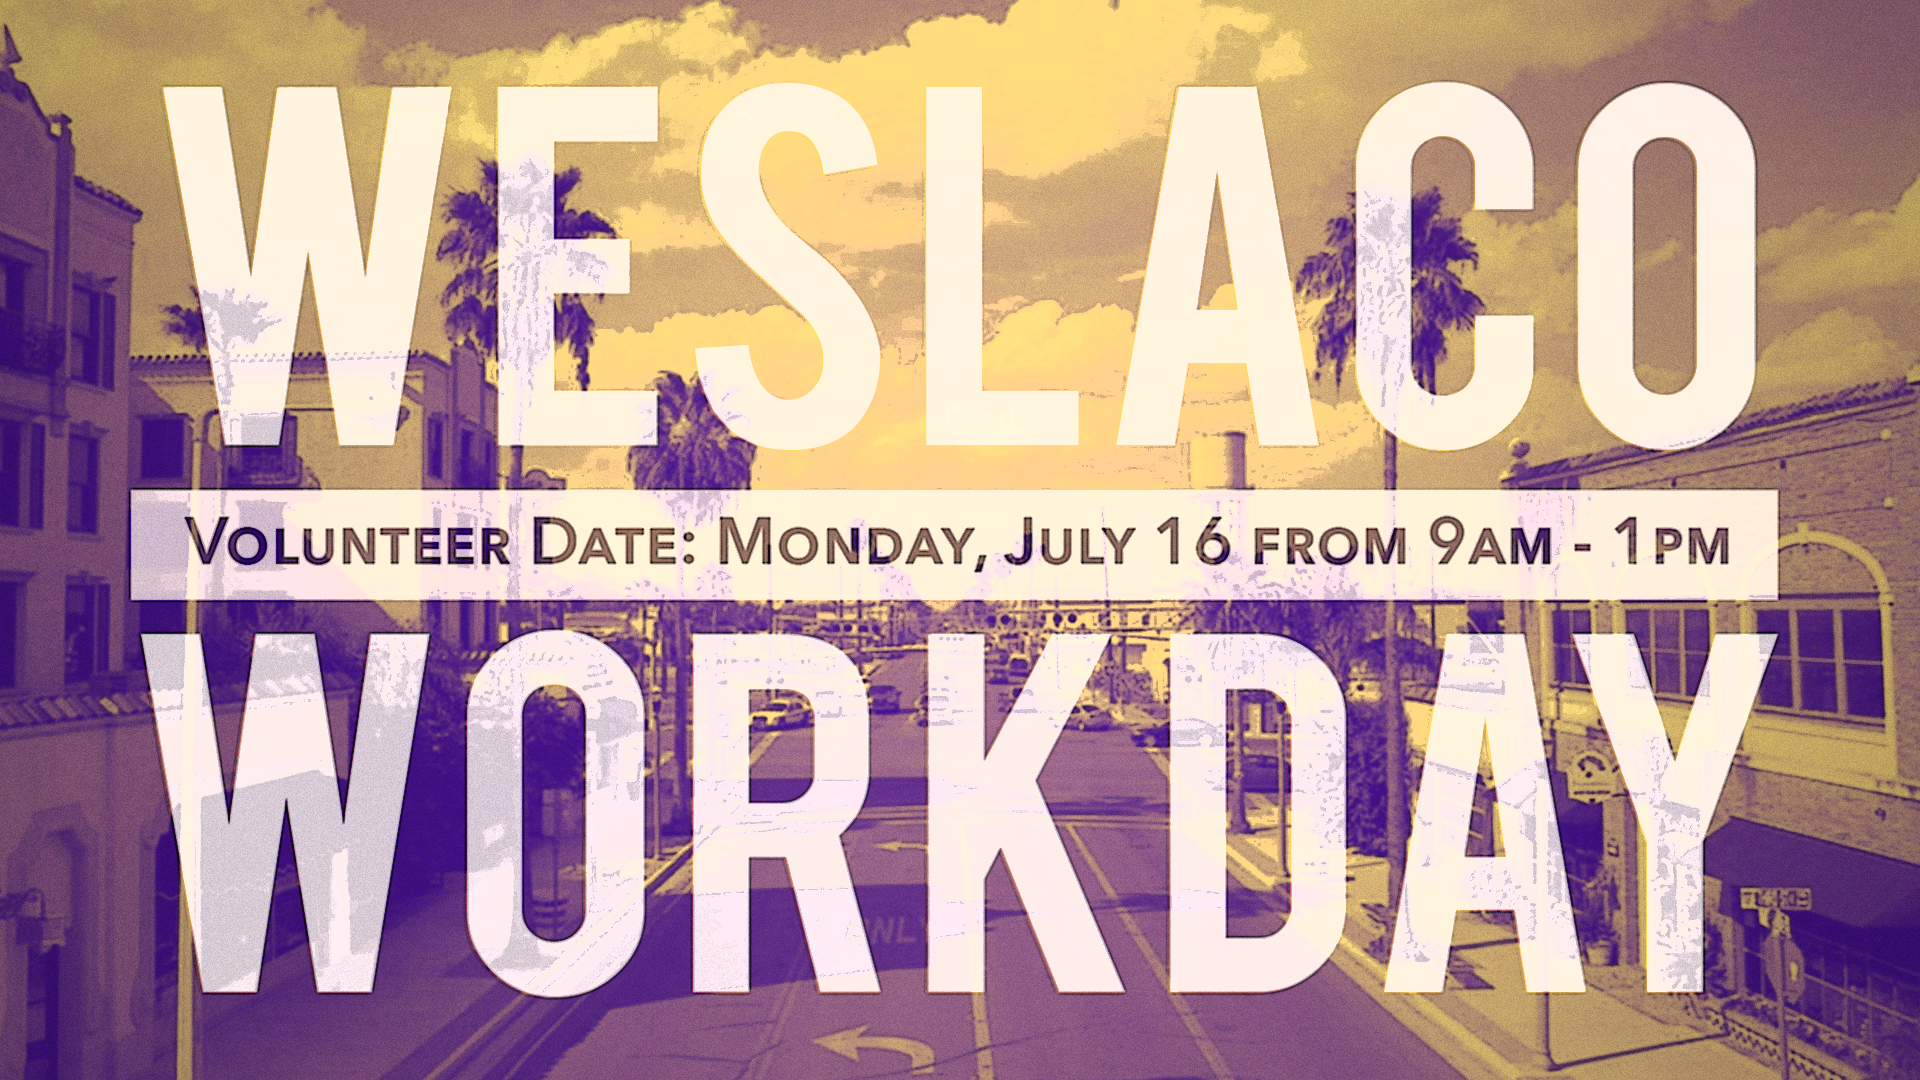 Weslaco Work Day   7/9/18